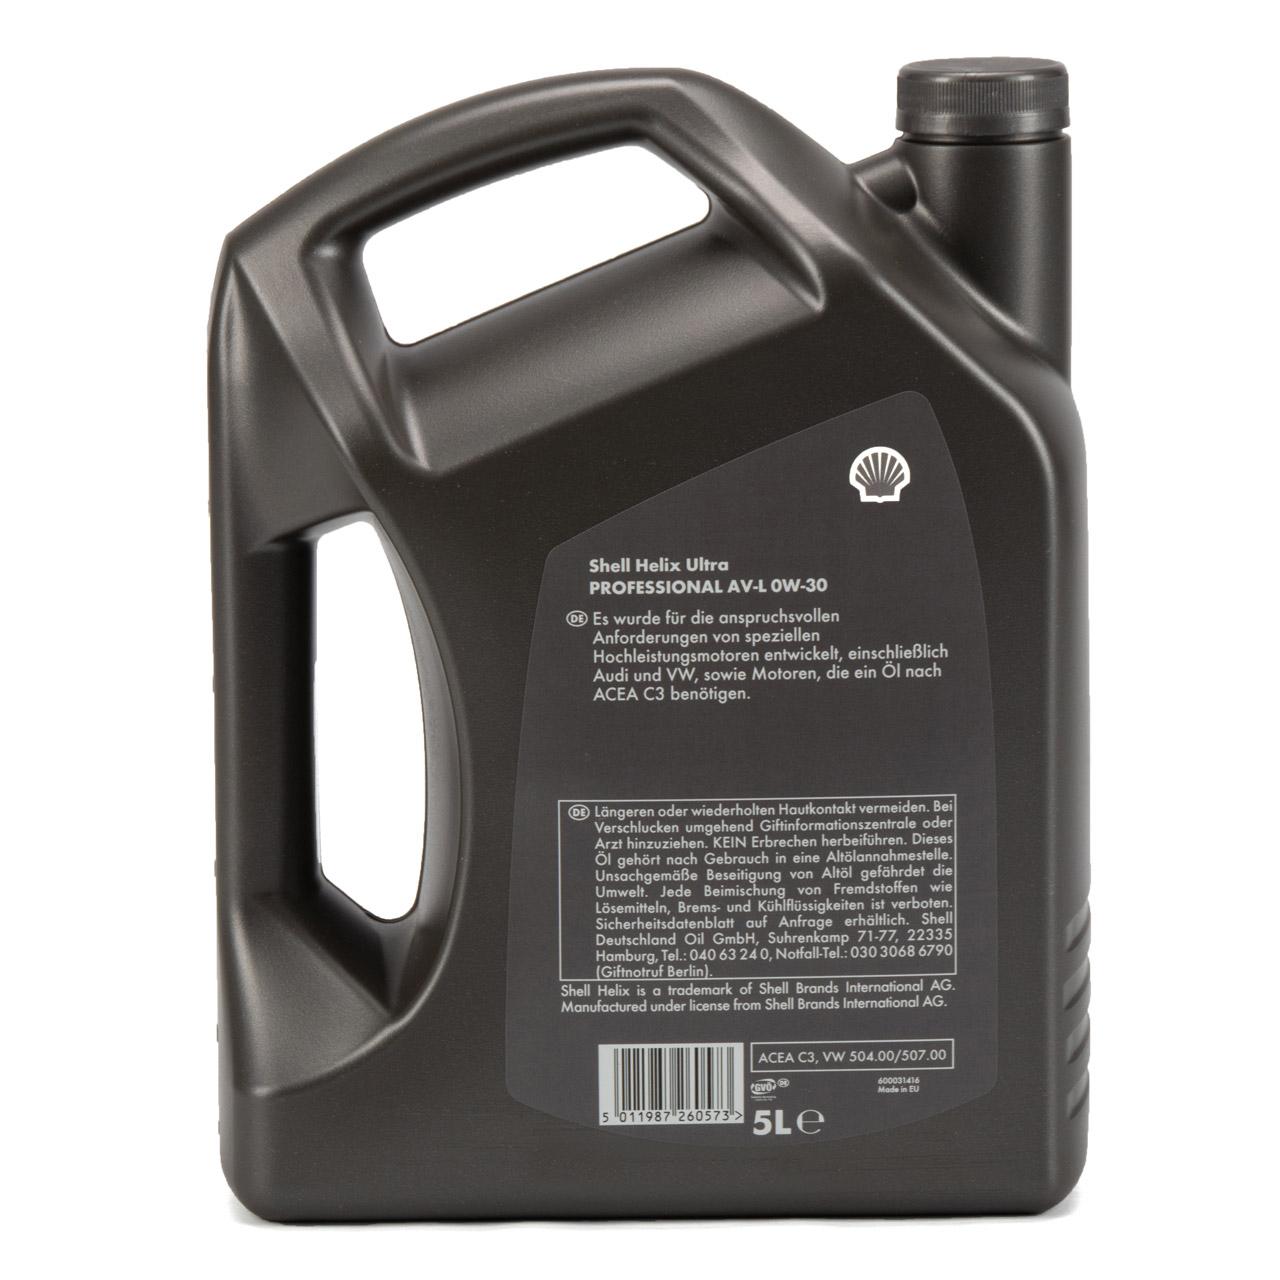 SHELL Motoröl Öl HELIX ULTRA Professional AV-L 0W30 VW 504.00/507.00 - 5 Liter